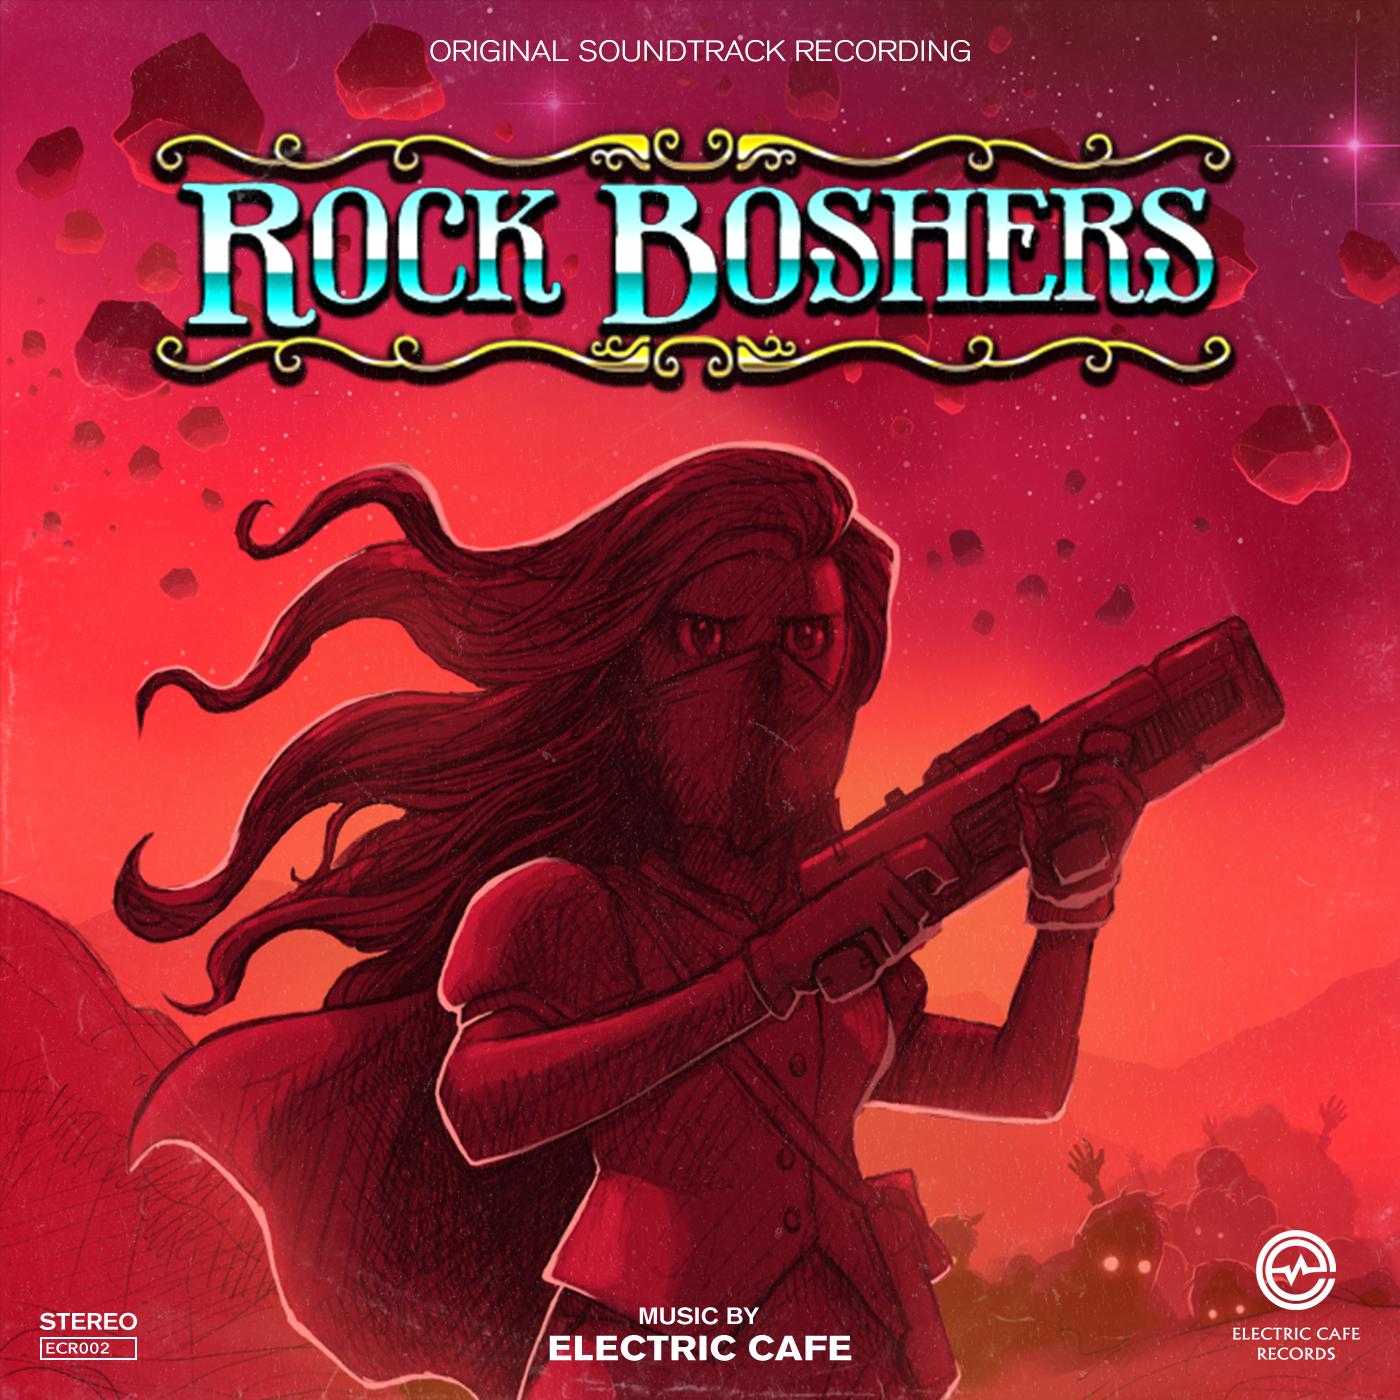 ECR002_rockboshers.png